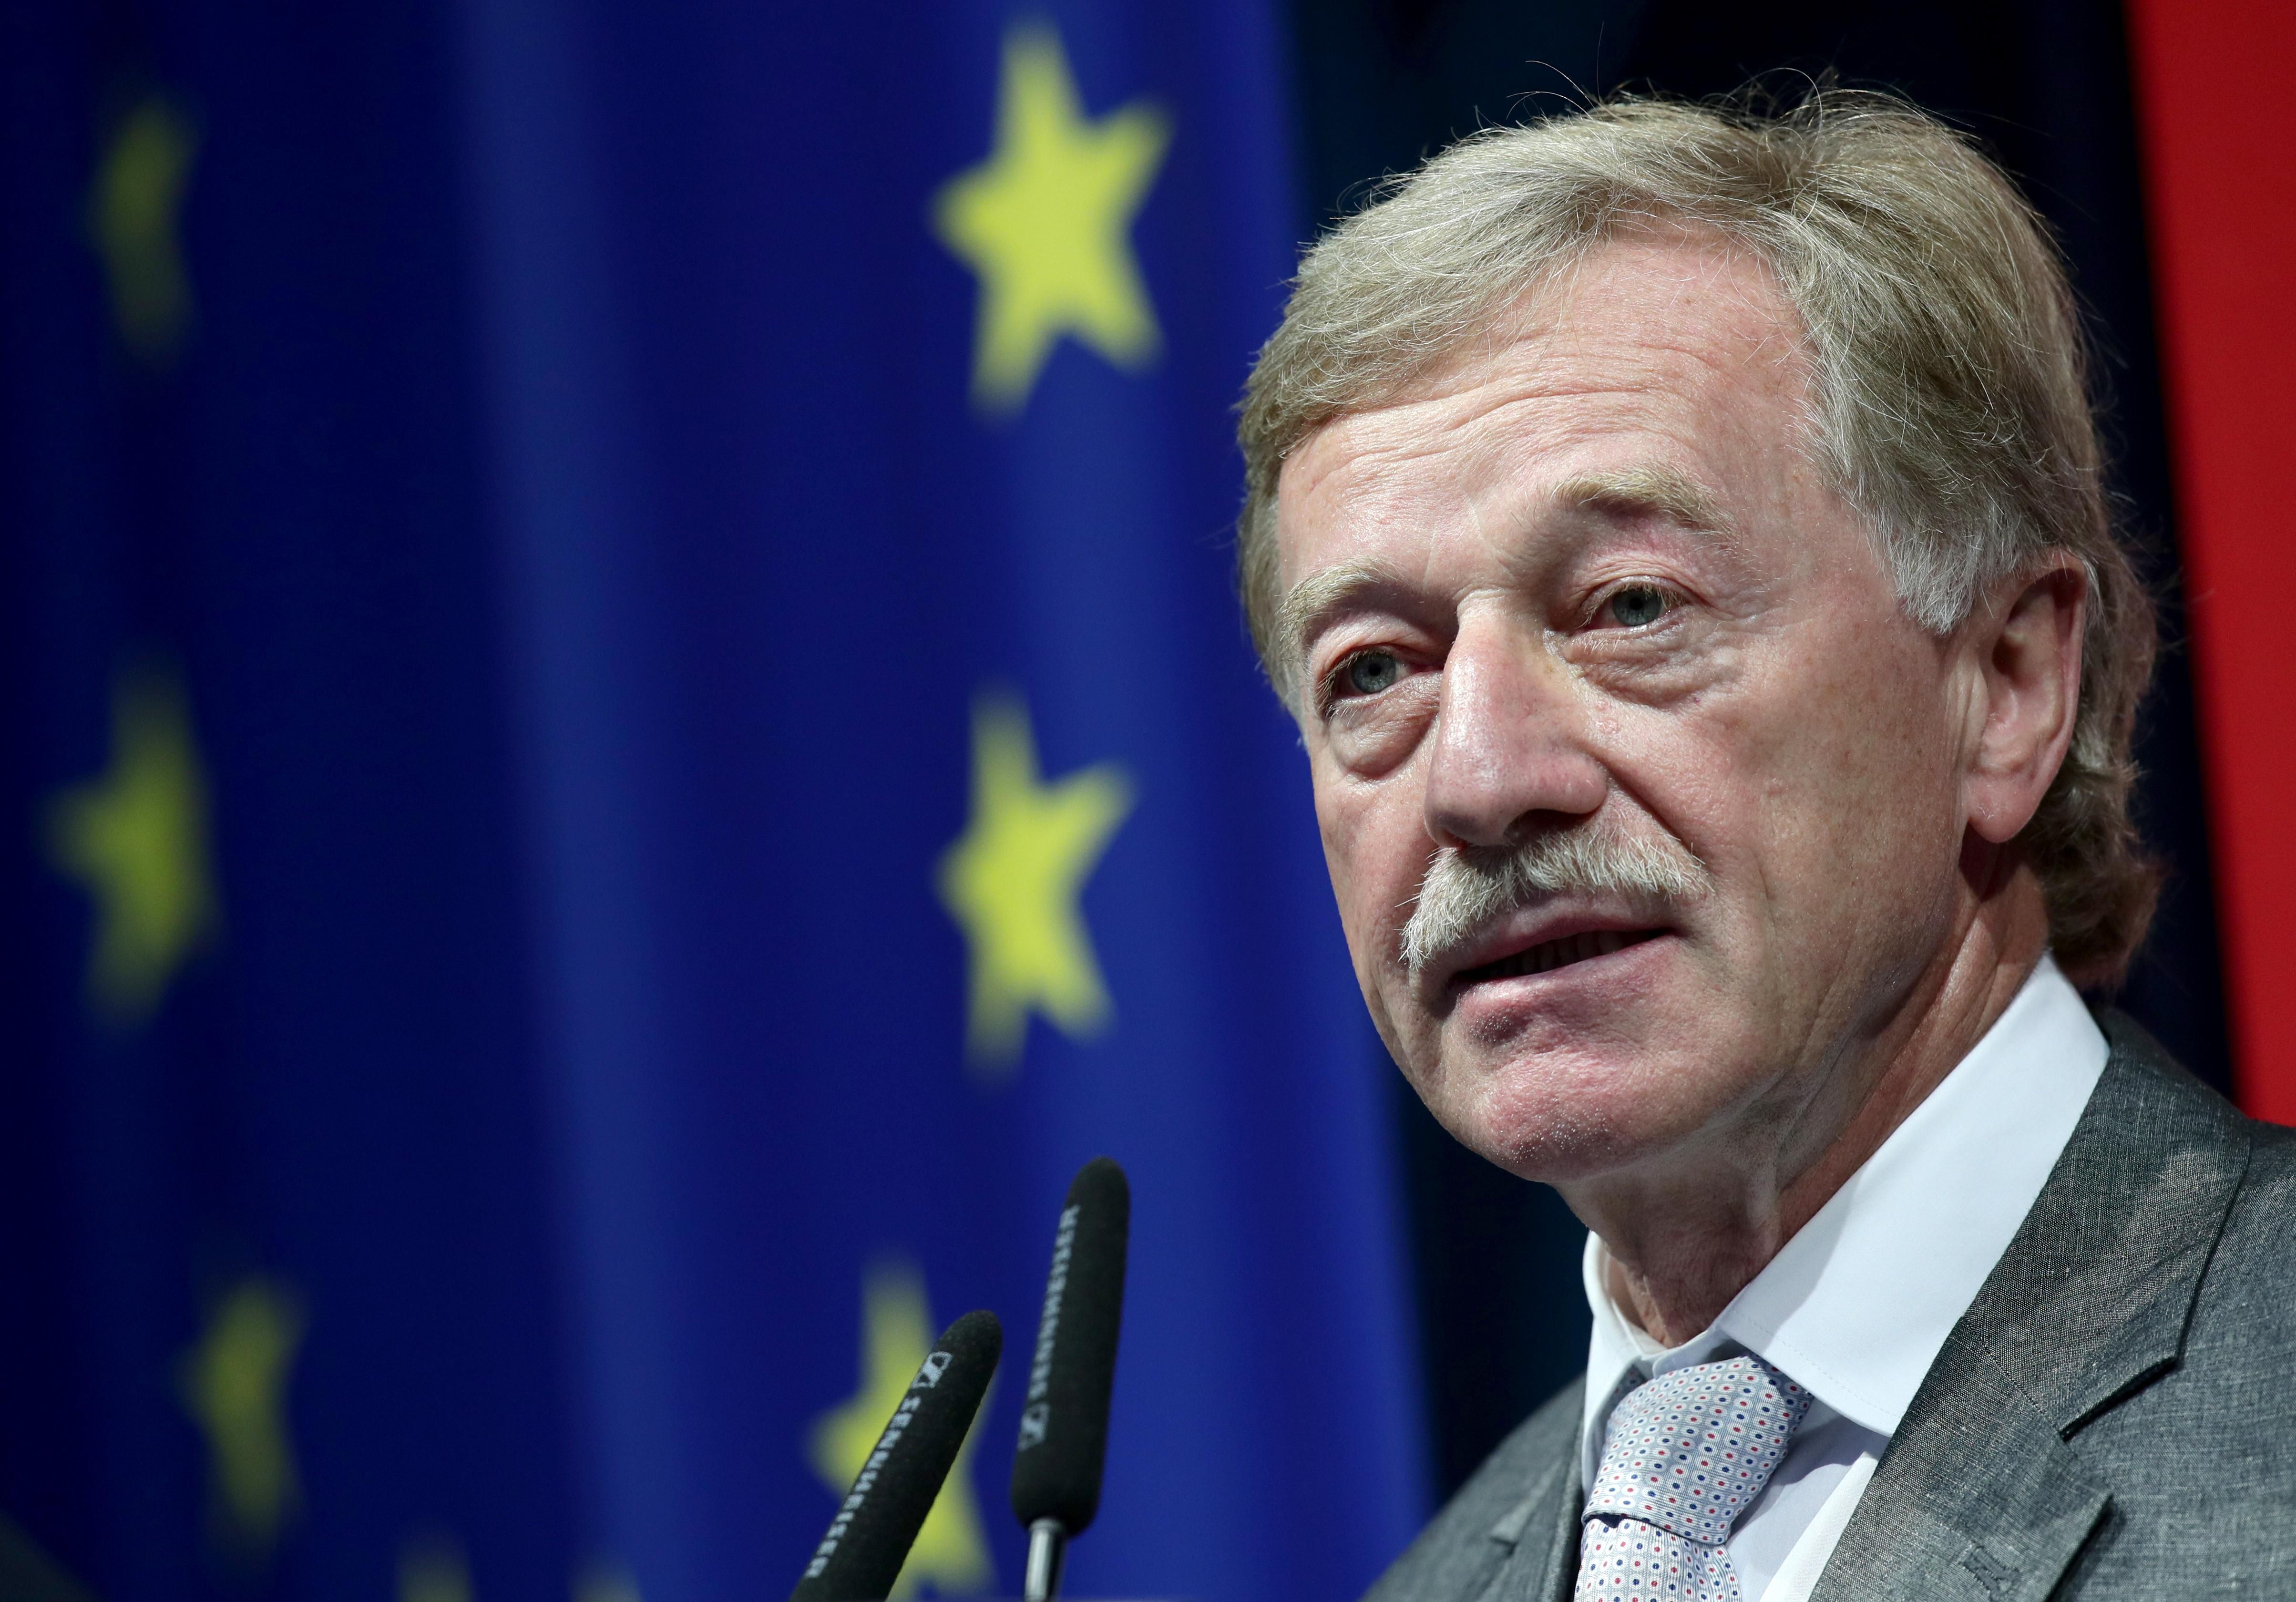 Stabilizing euro zone growth vindicates ECB: Mersch